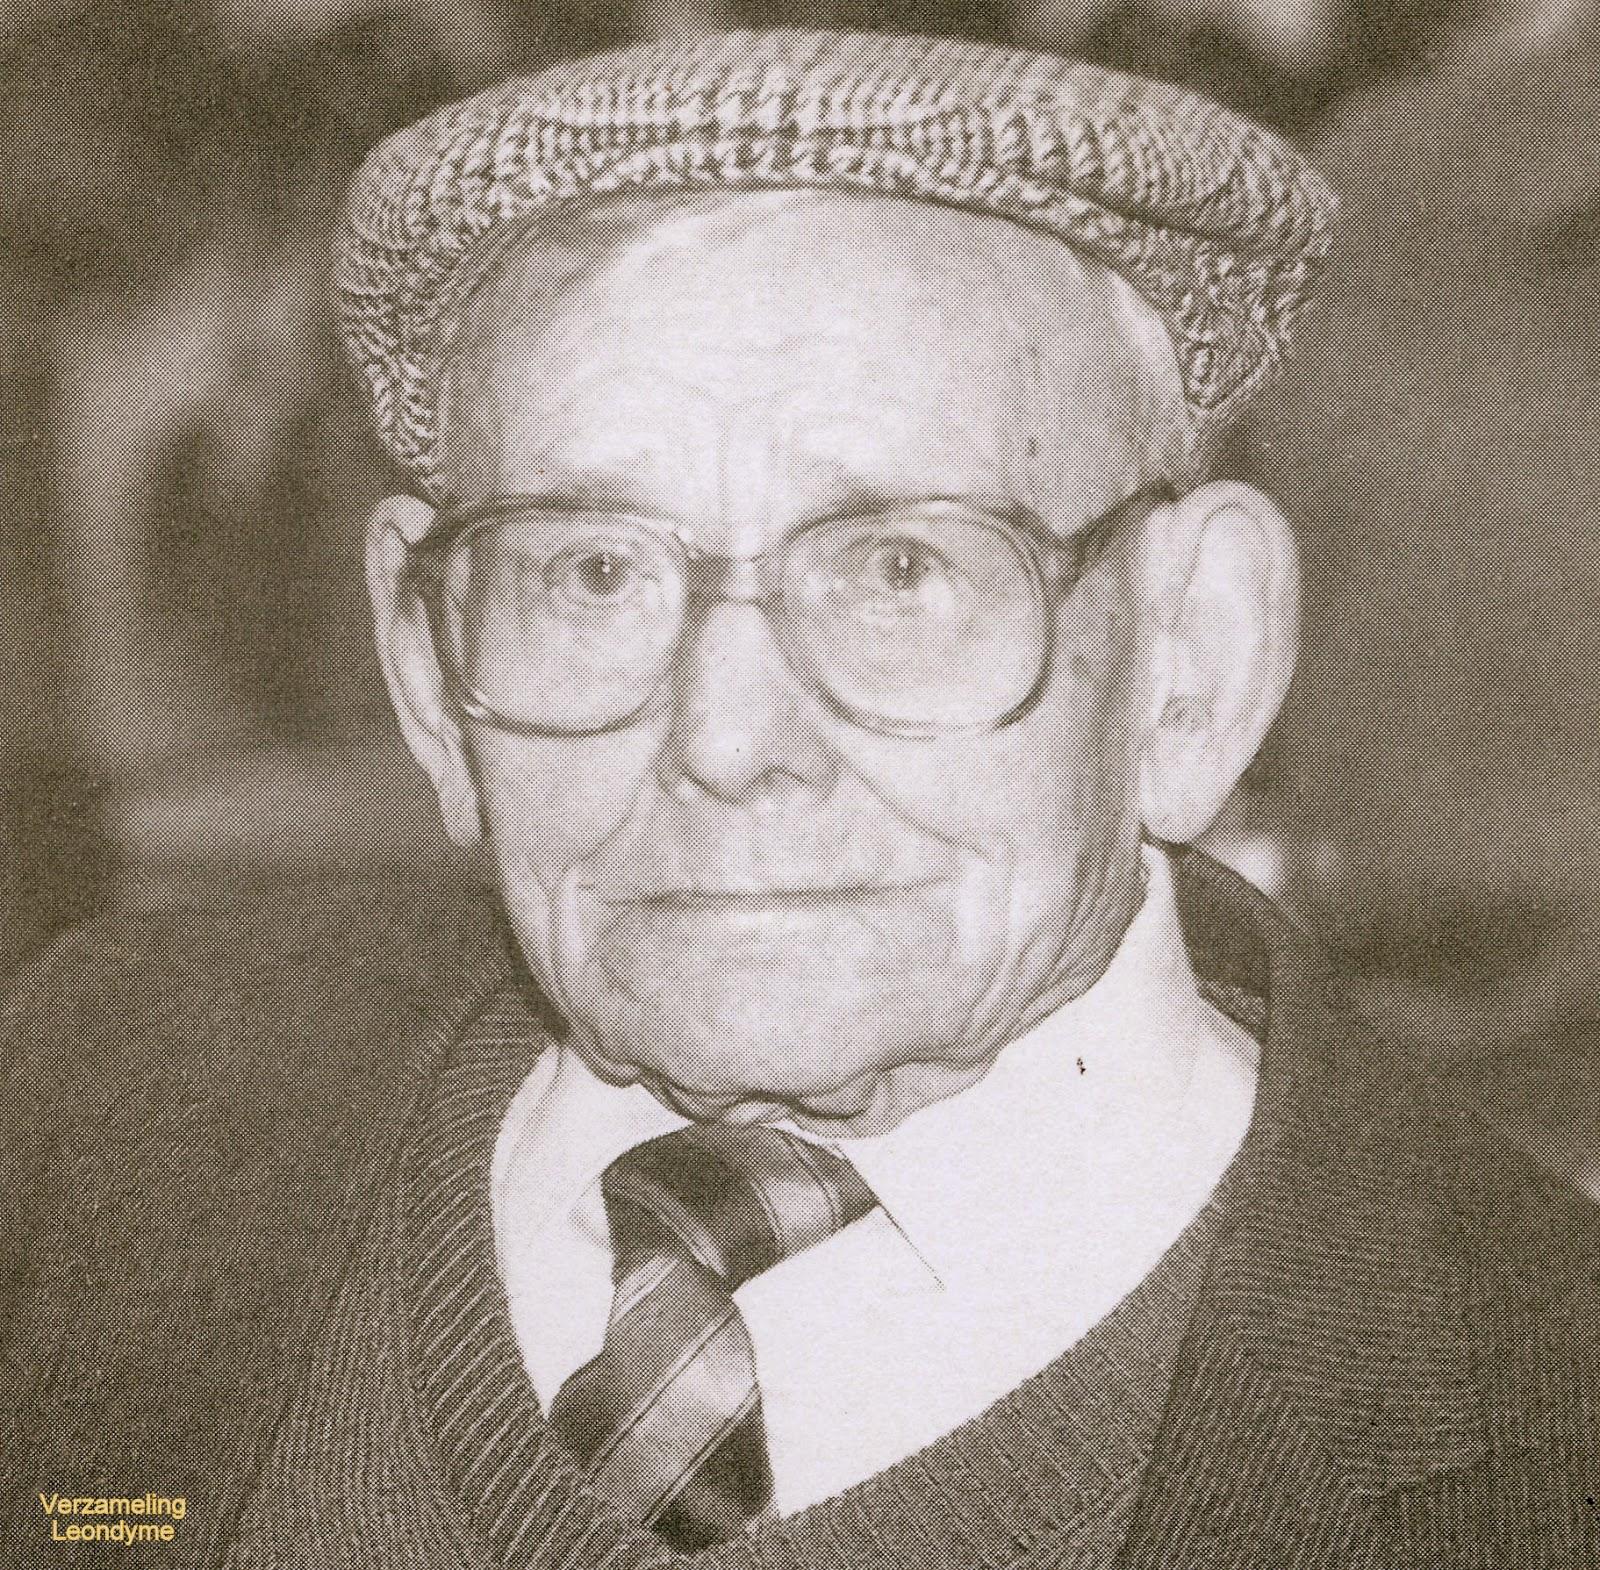 Edmond Demets, civielarbeider Eerste Wereldoorlog. Verzameling Leondyme